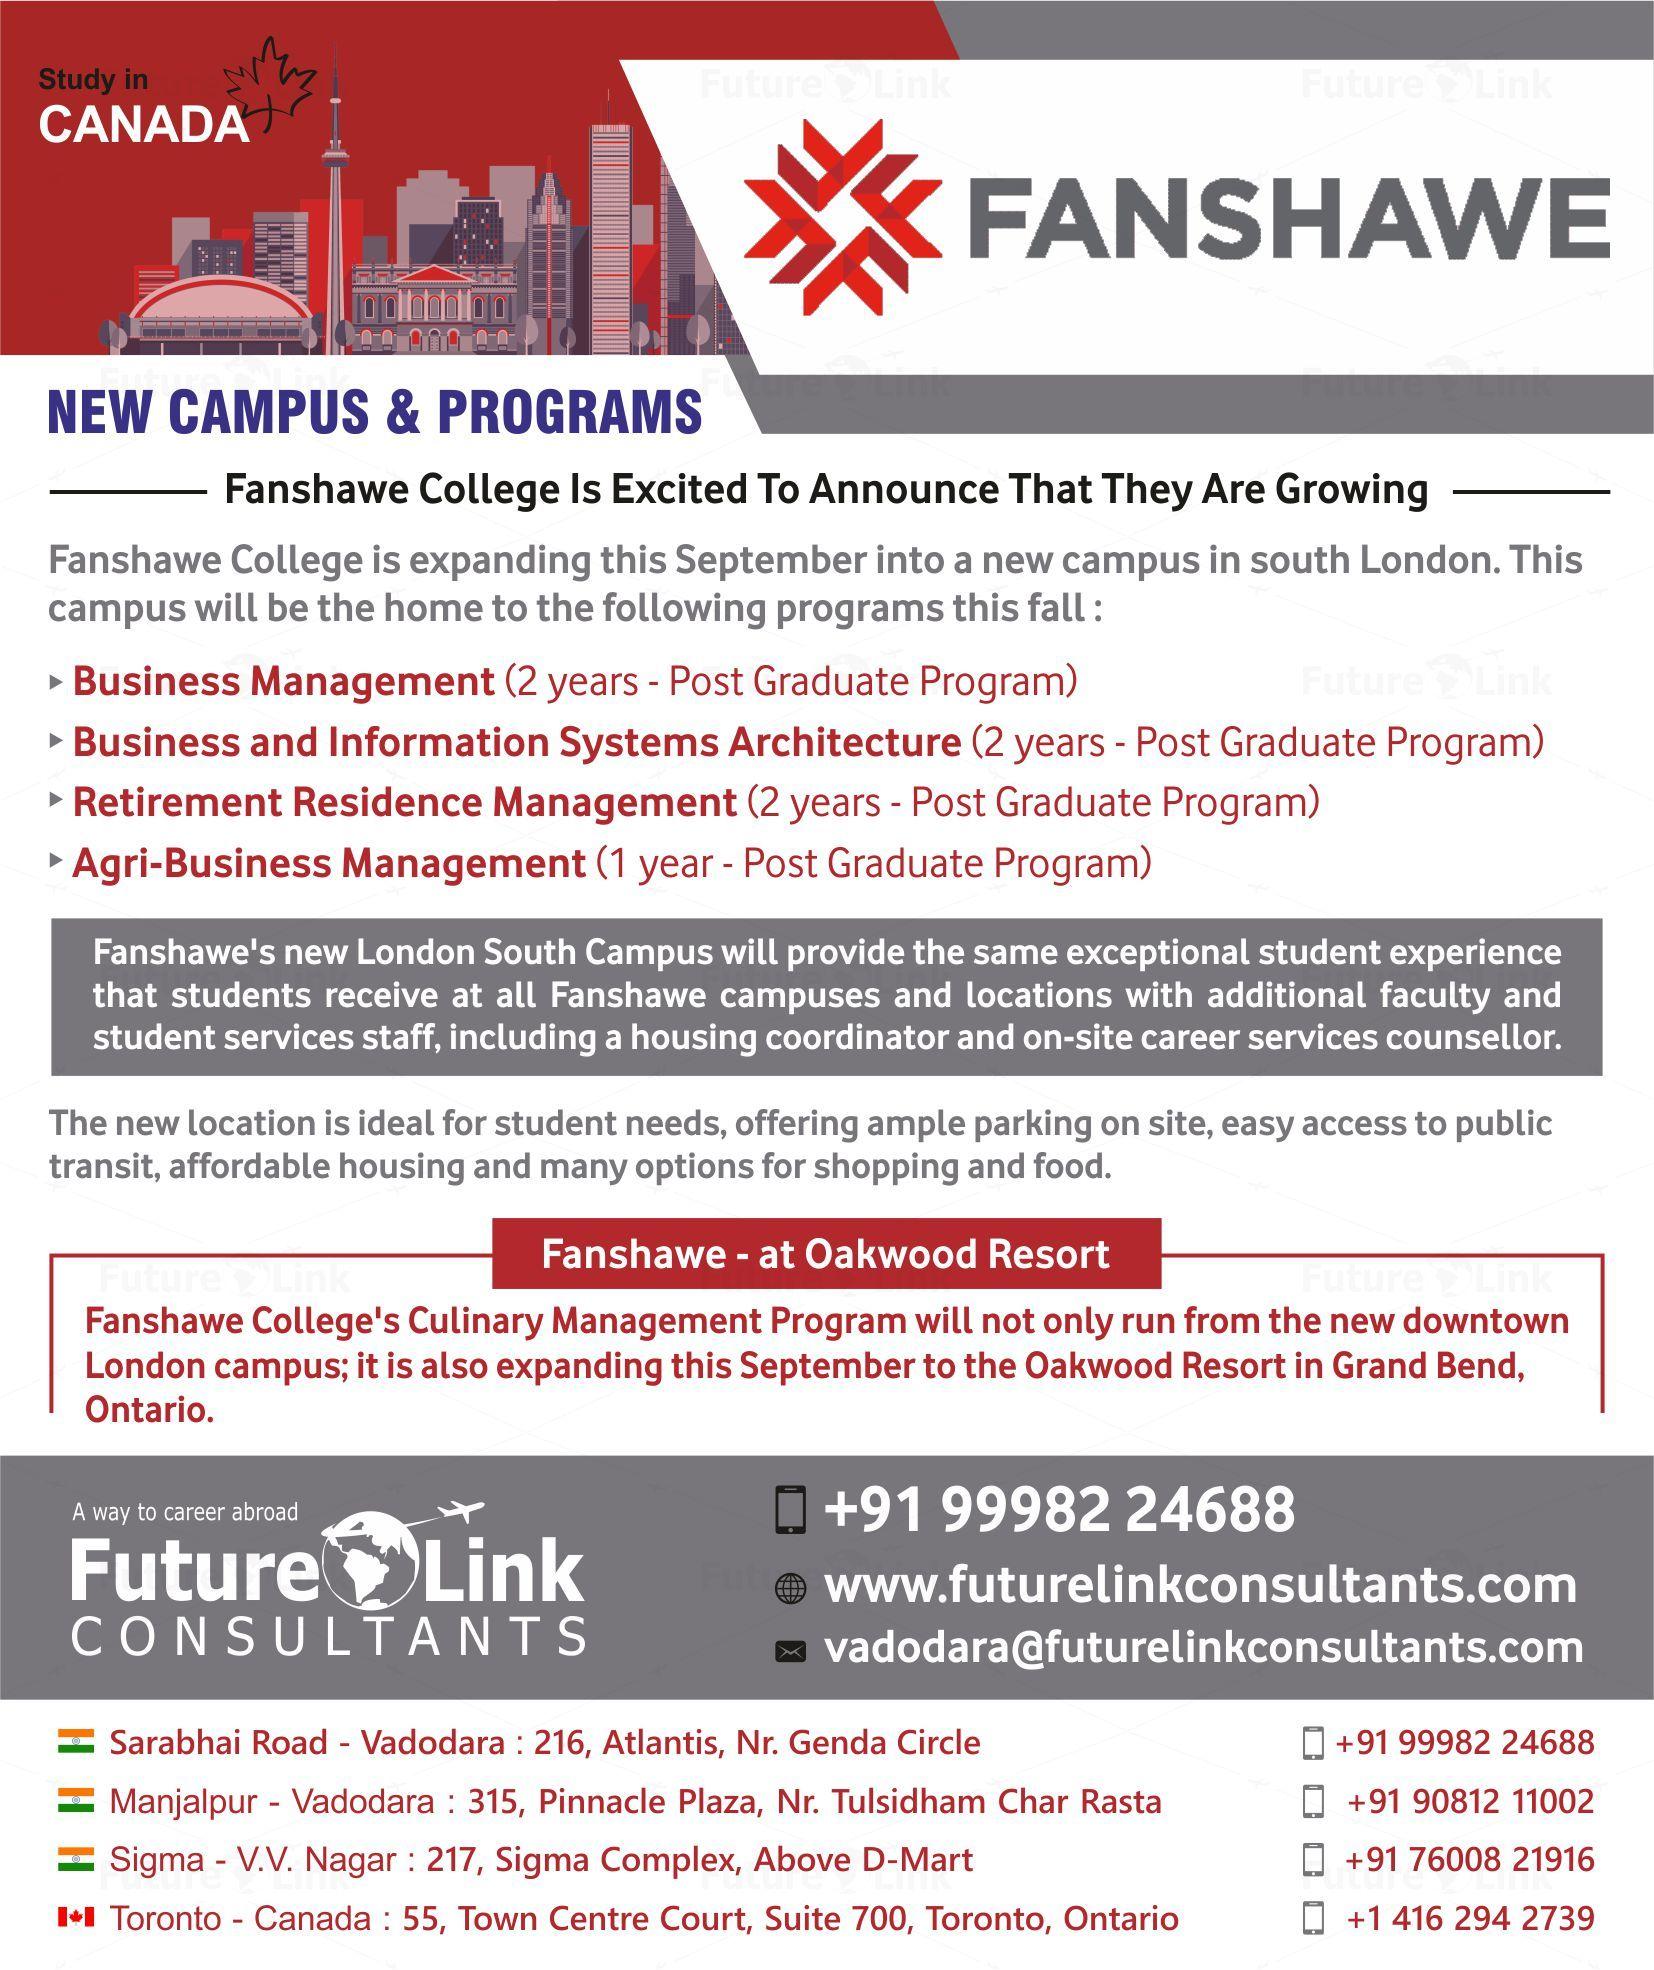 Fanshawe College Canada Graduate Program Canada Business Management